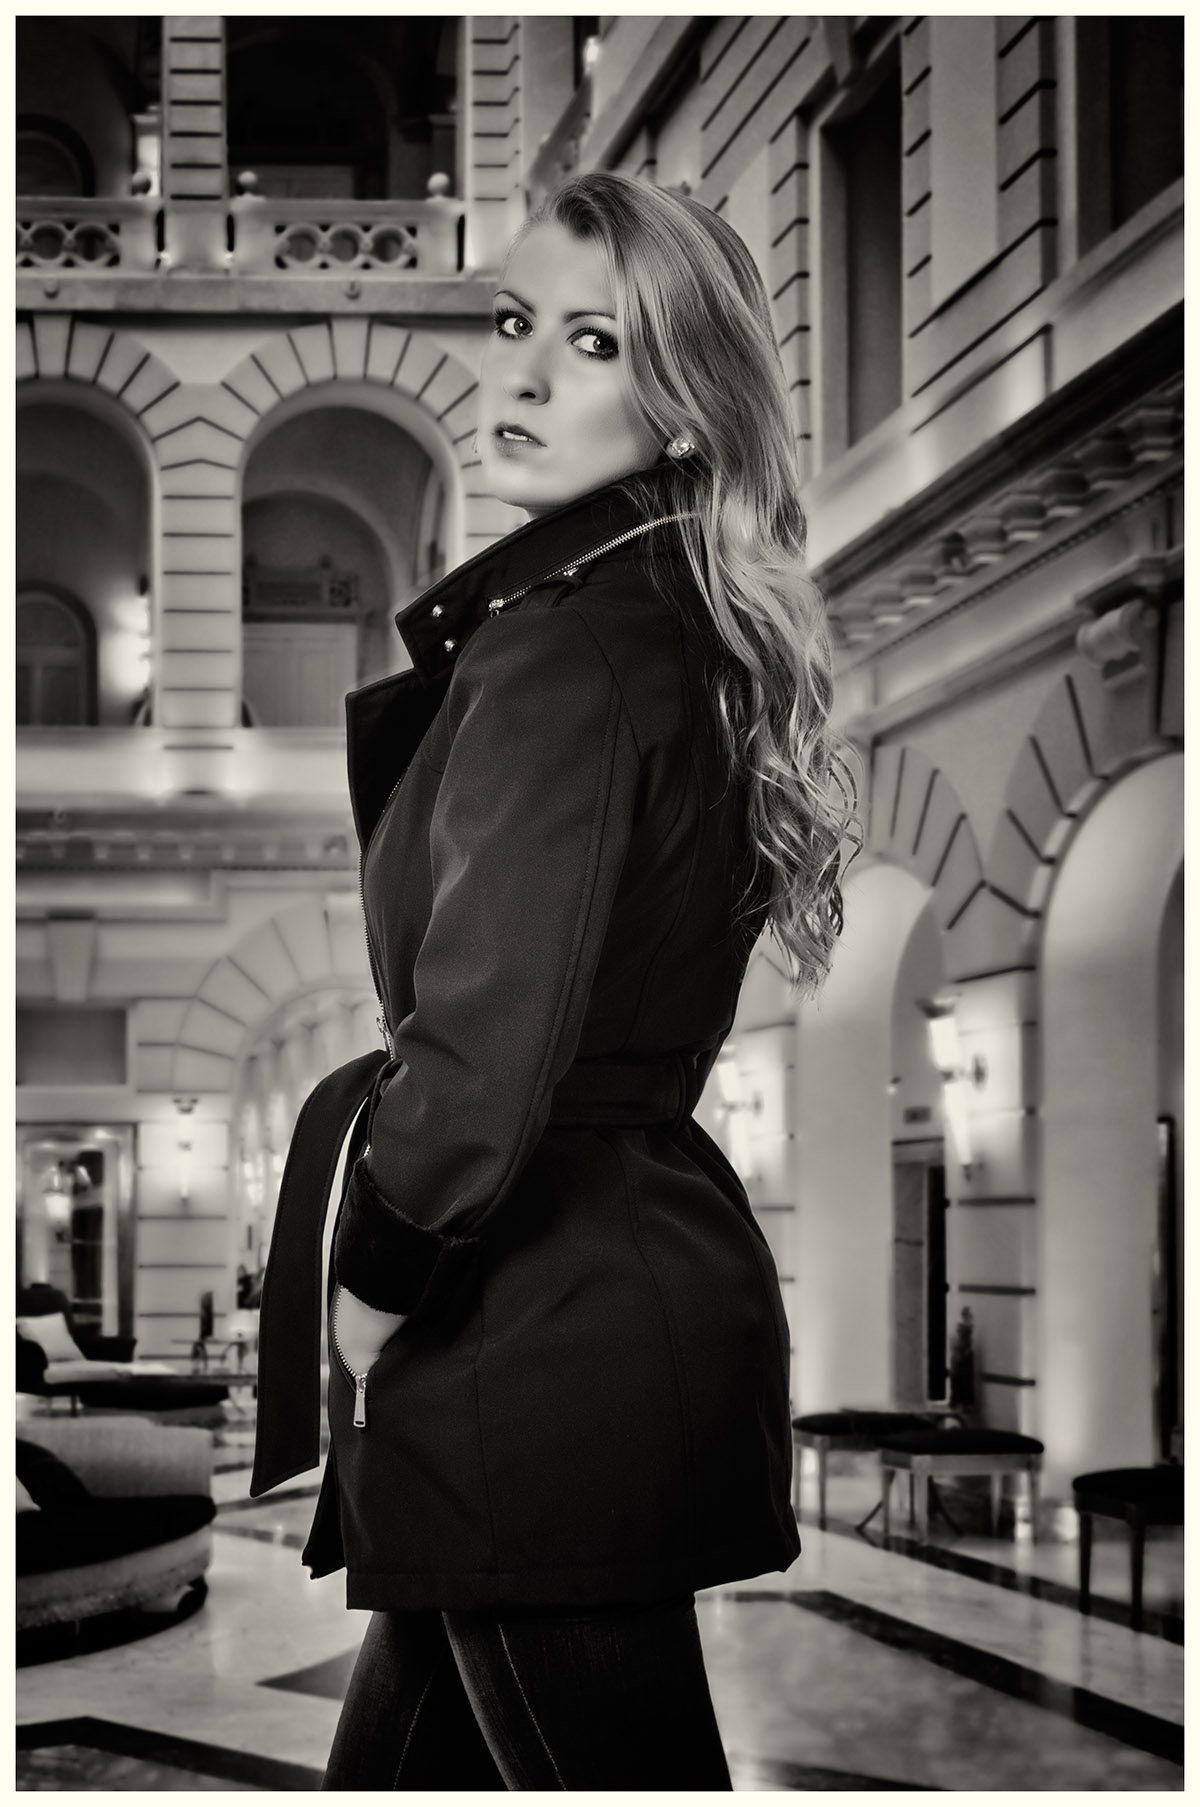 Trench Coat Black and white fashion portrait